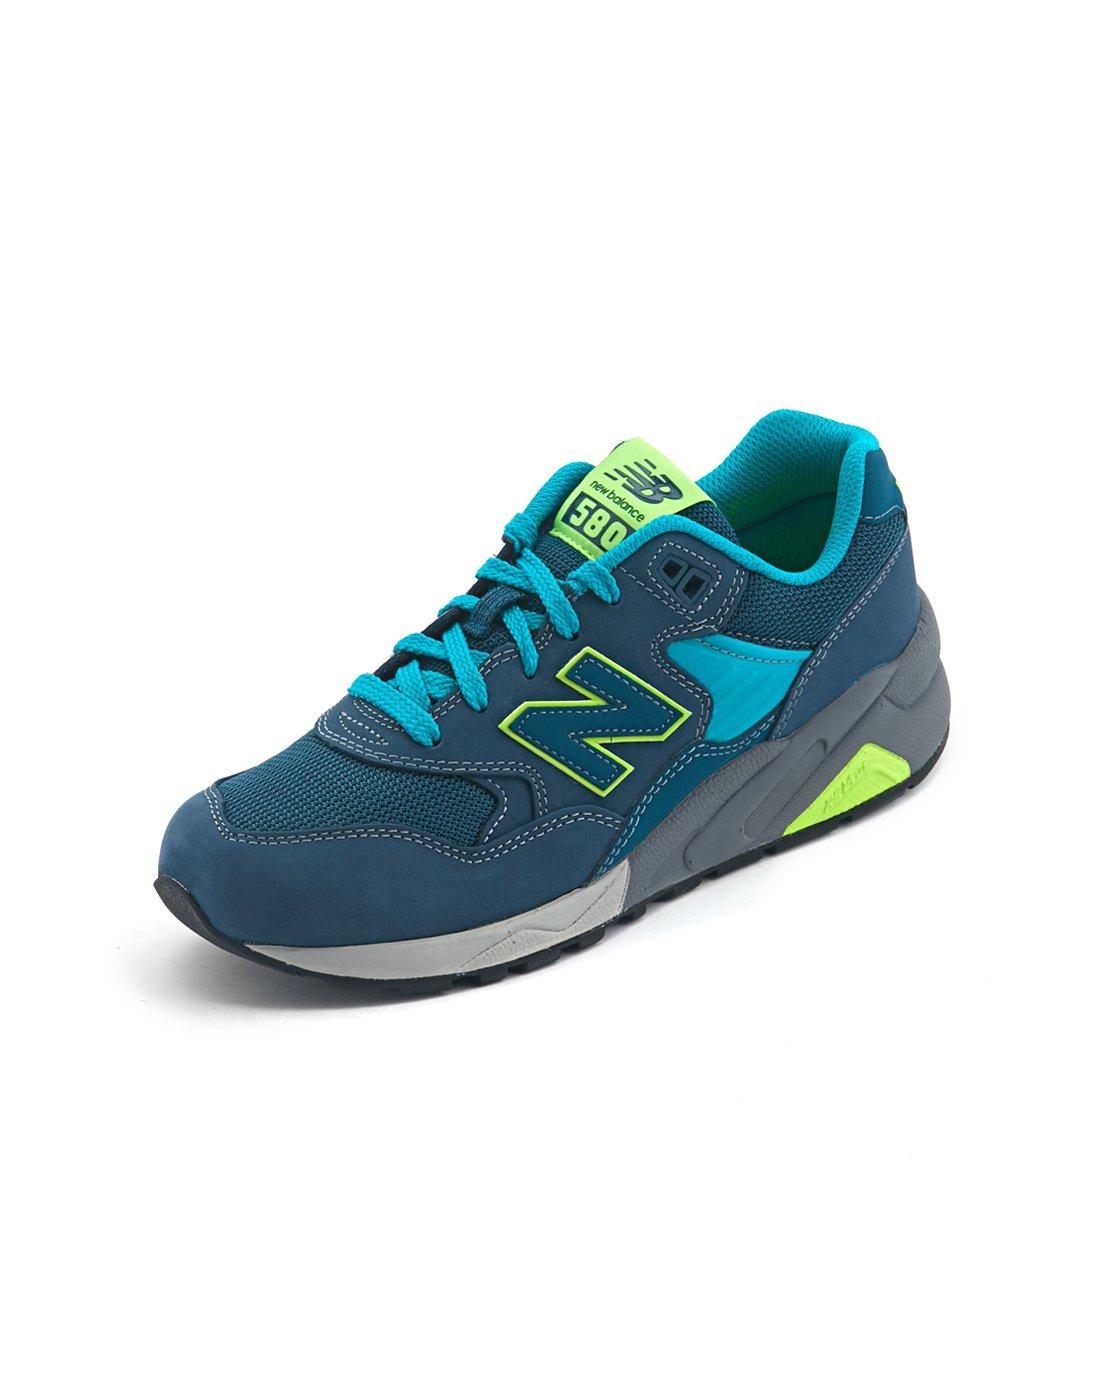 ... best cheap f3799 0e3a8 New BalanceNew balance 580系列中性藏青色经典鞋MRT580GT 000eb1c5038b